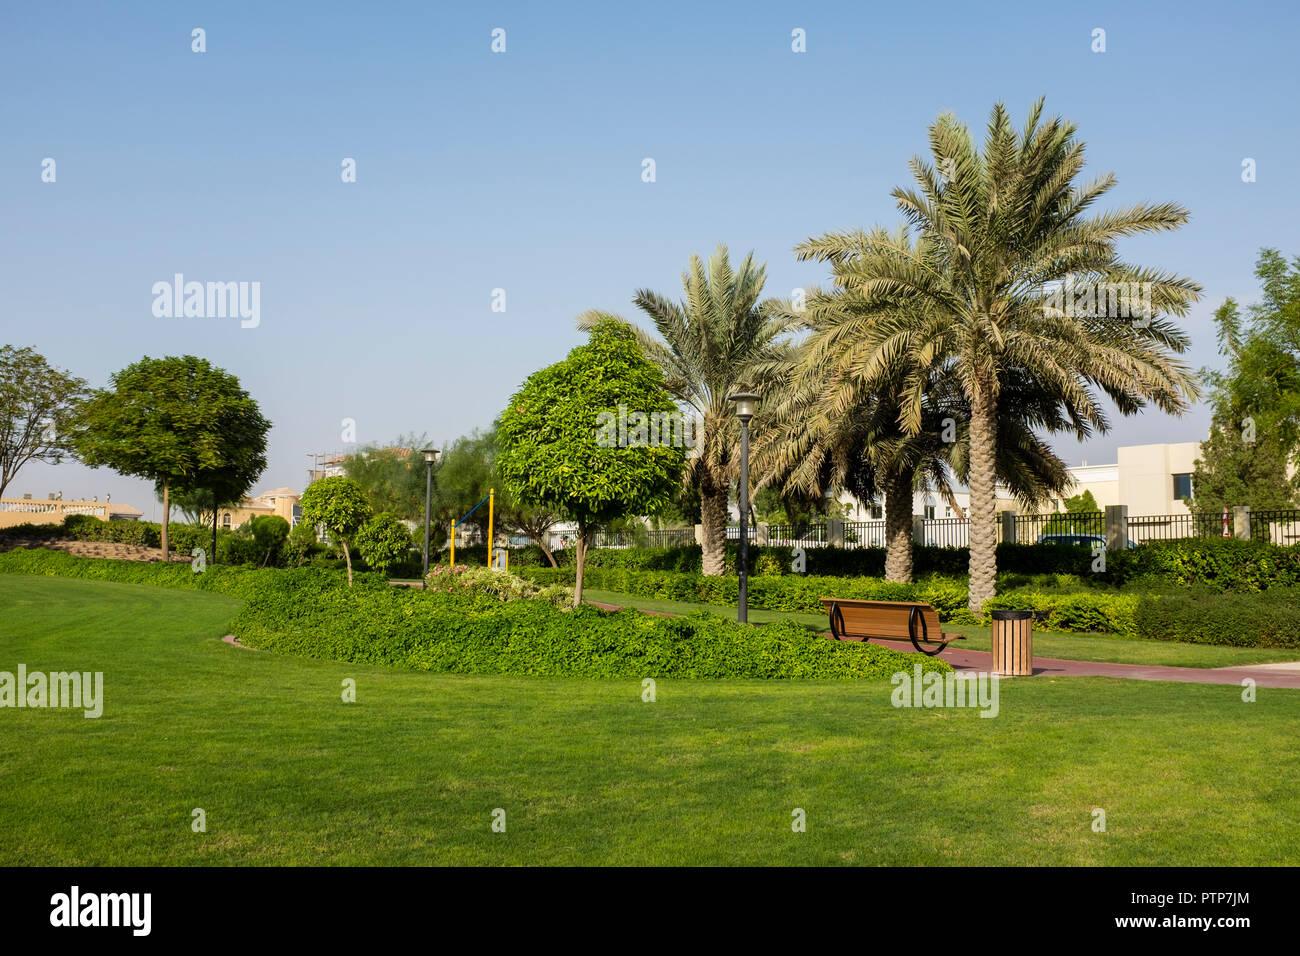 Uptown Mirdiff Park in the Mirdiff district of Dubai, UAE - Stock Image